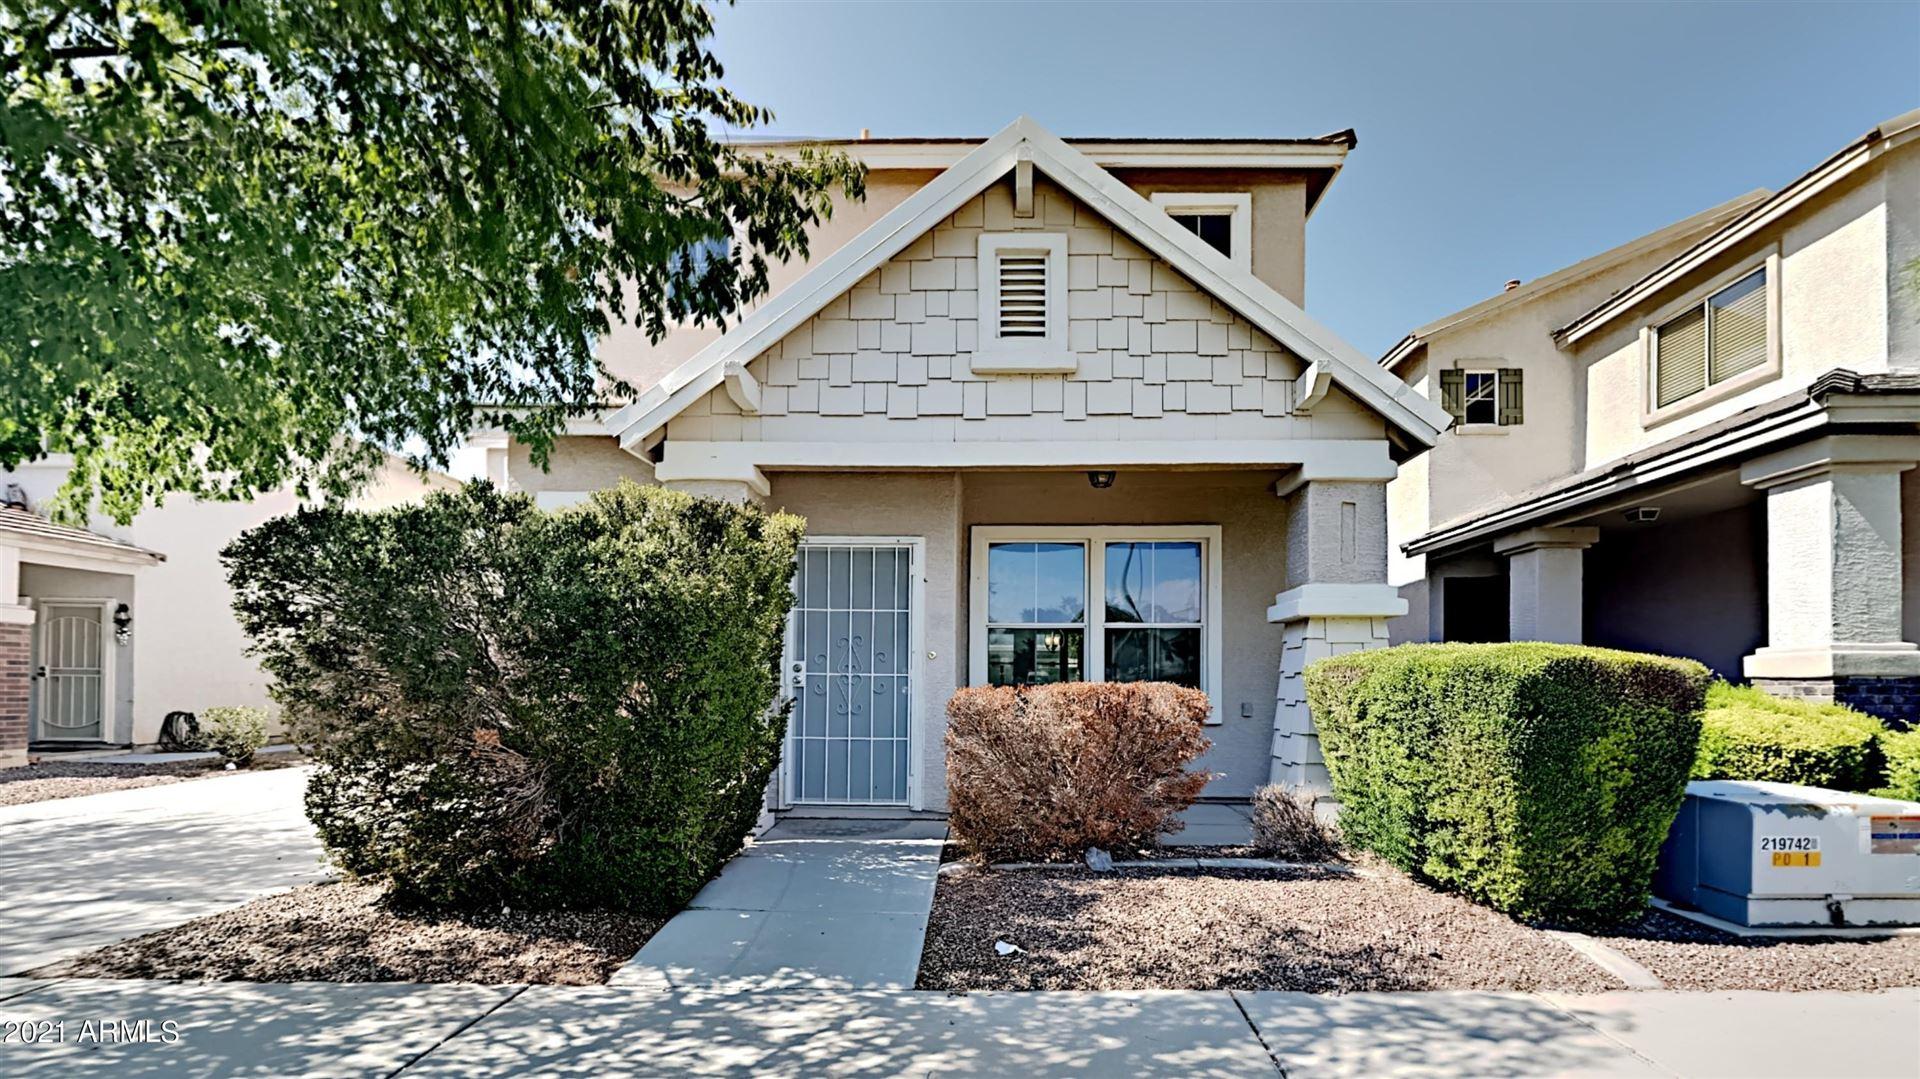 12018 W YUMA Street, Avondale, AZ 85323 - MLS#: 6259373